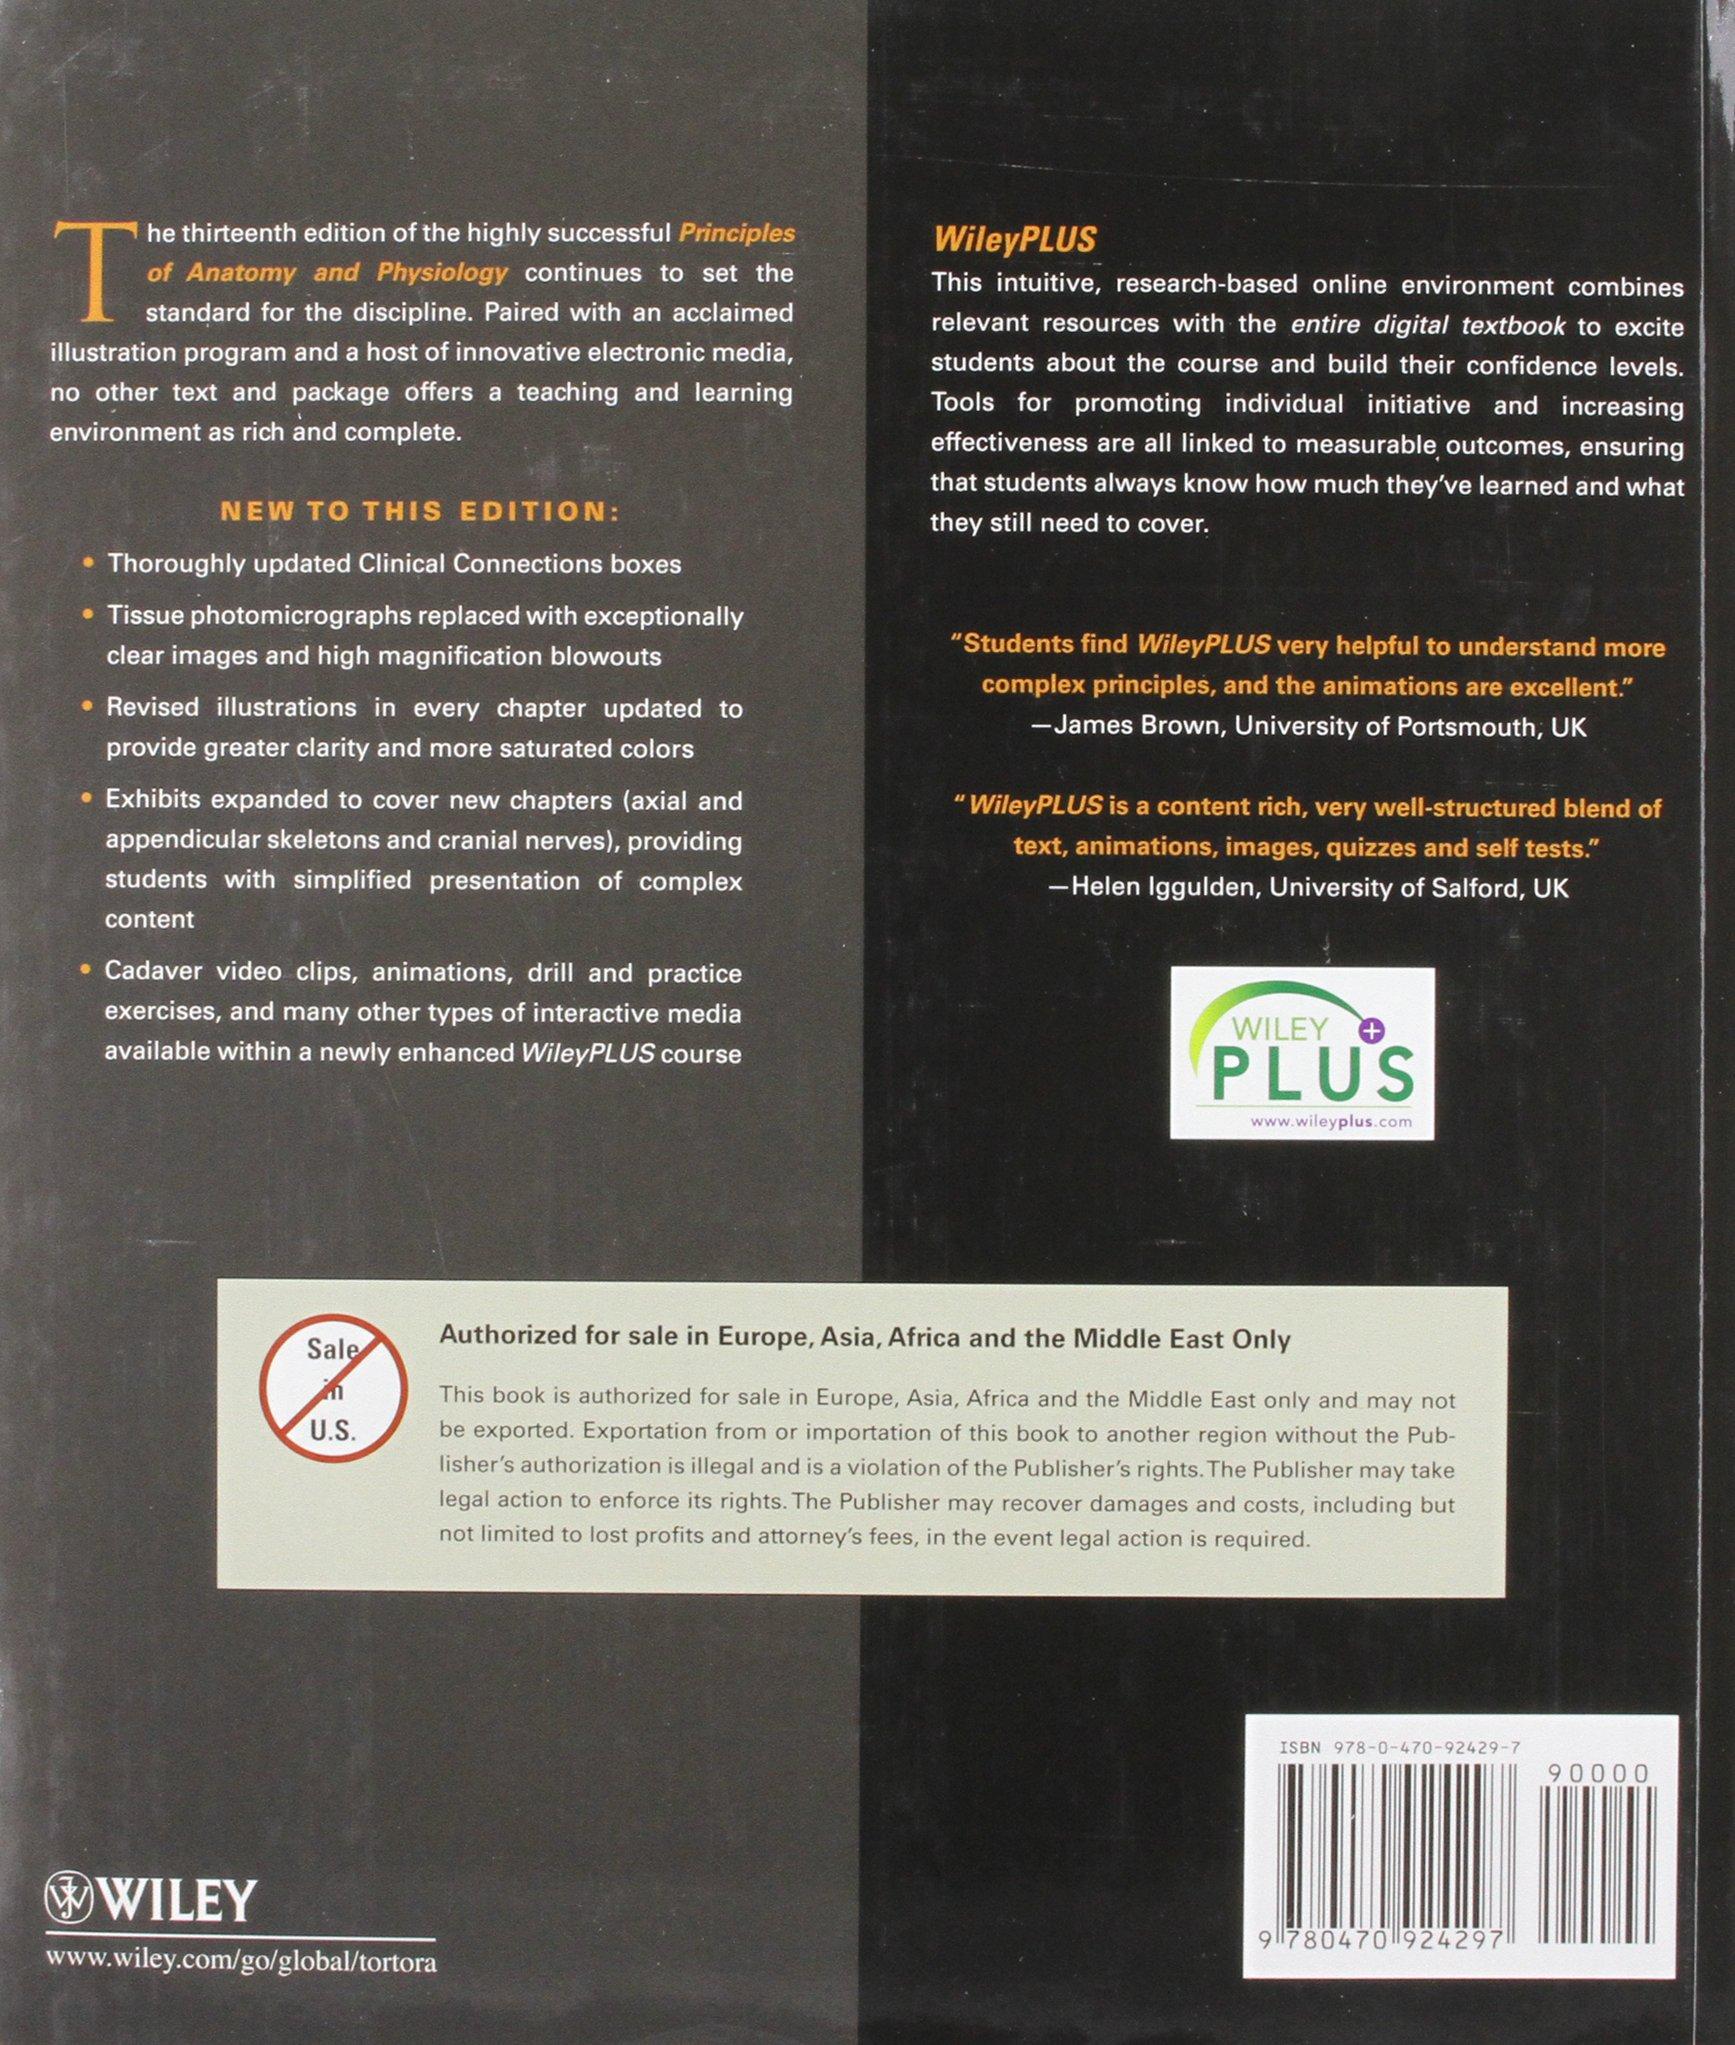 Principles of Anatomy & Physiology 13th: Amazon.co.uk: Gerard J ...